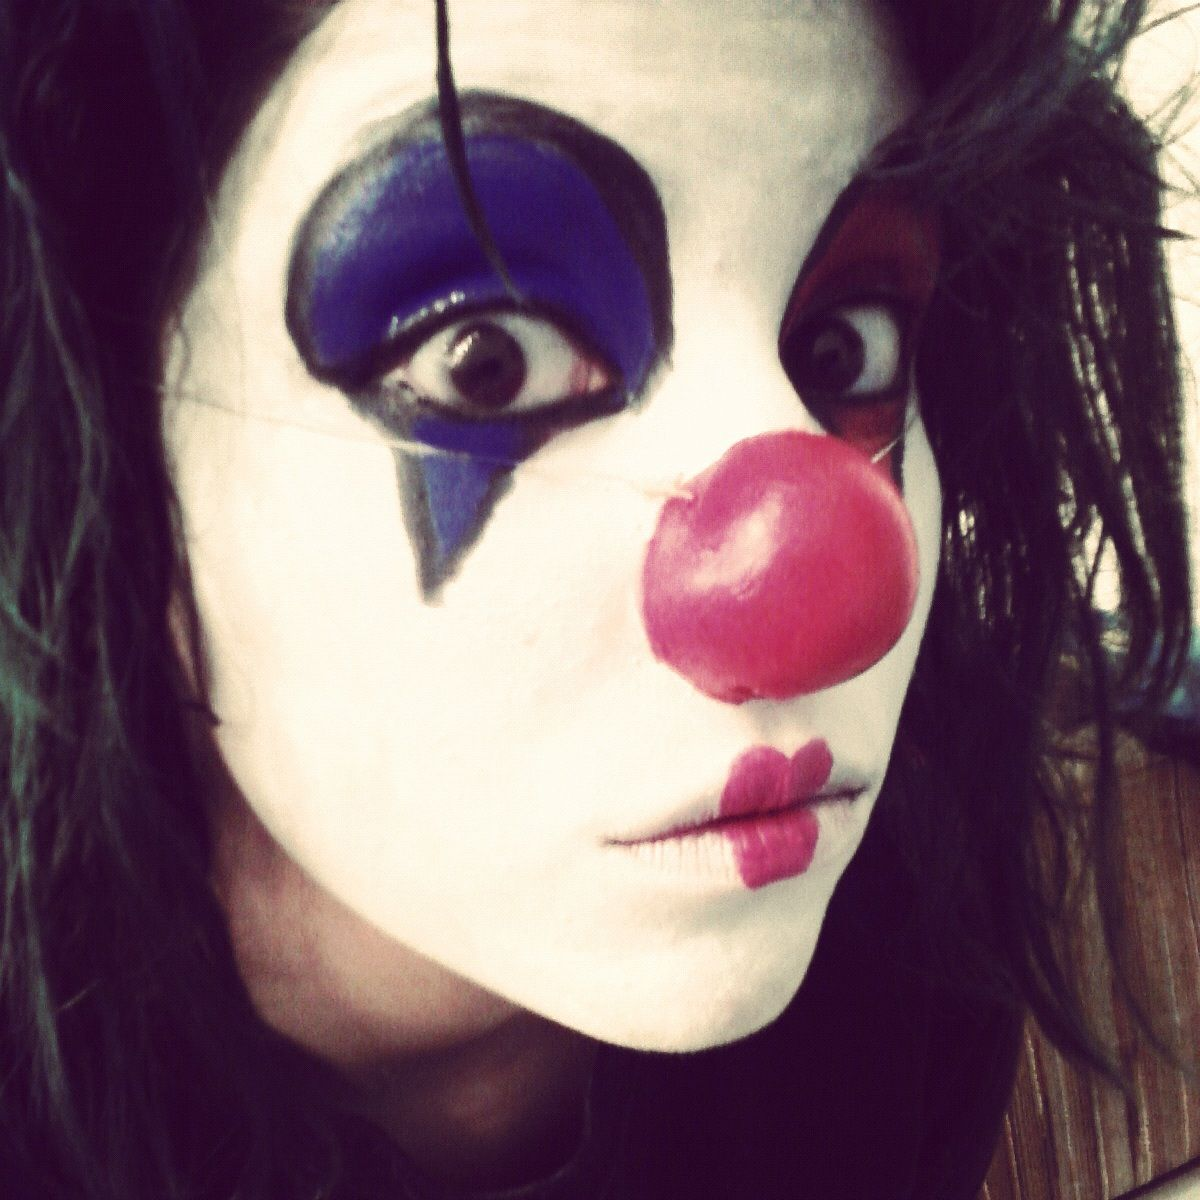 Infected Mushroom Latest Songs Classy inspiredinfected mushrooms new song! new clown in town! | fan